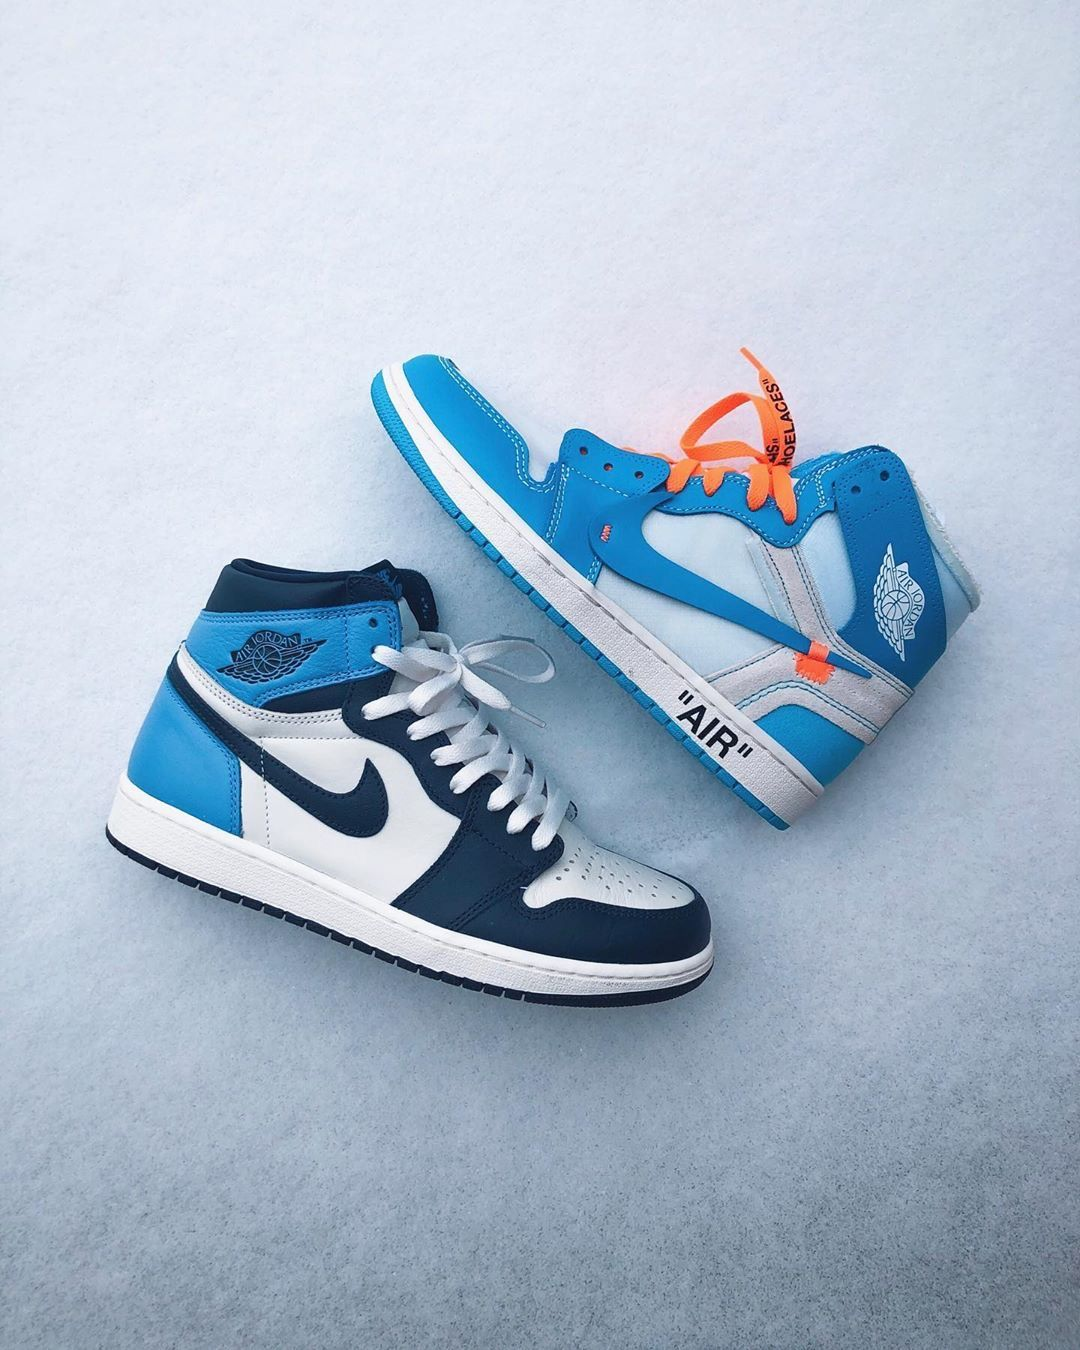 Air Jordan 1 Retro High Og Obsidian University Blue Nike Jordans Jordan 1 Retro High Off White University Blue In 2020 Cute Nike Shoes Nike Air Shoes Hype Shoes